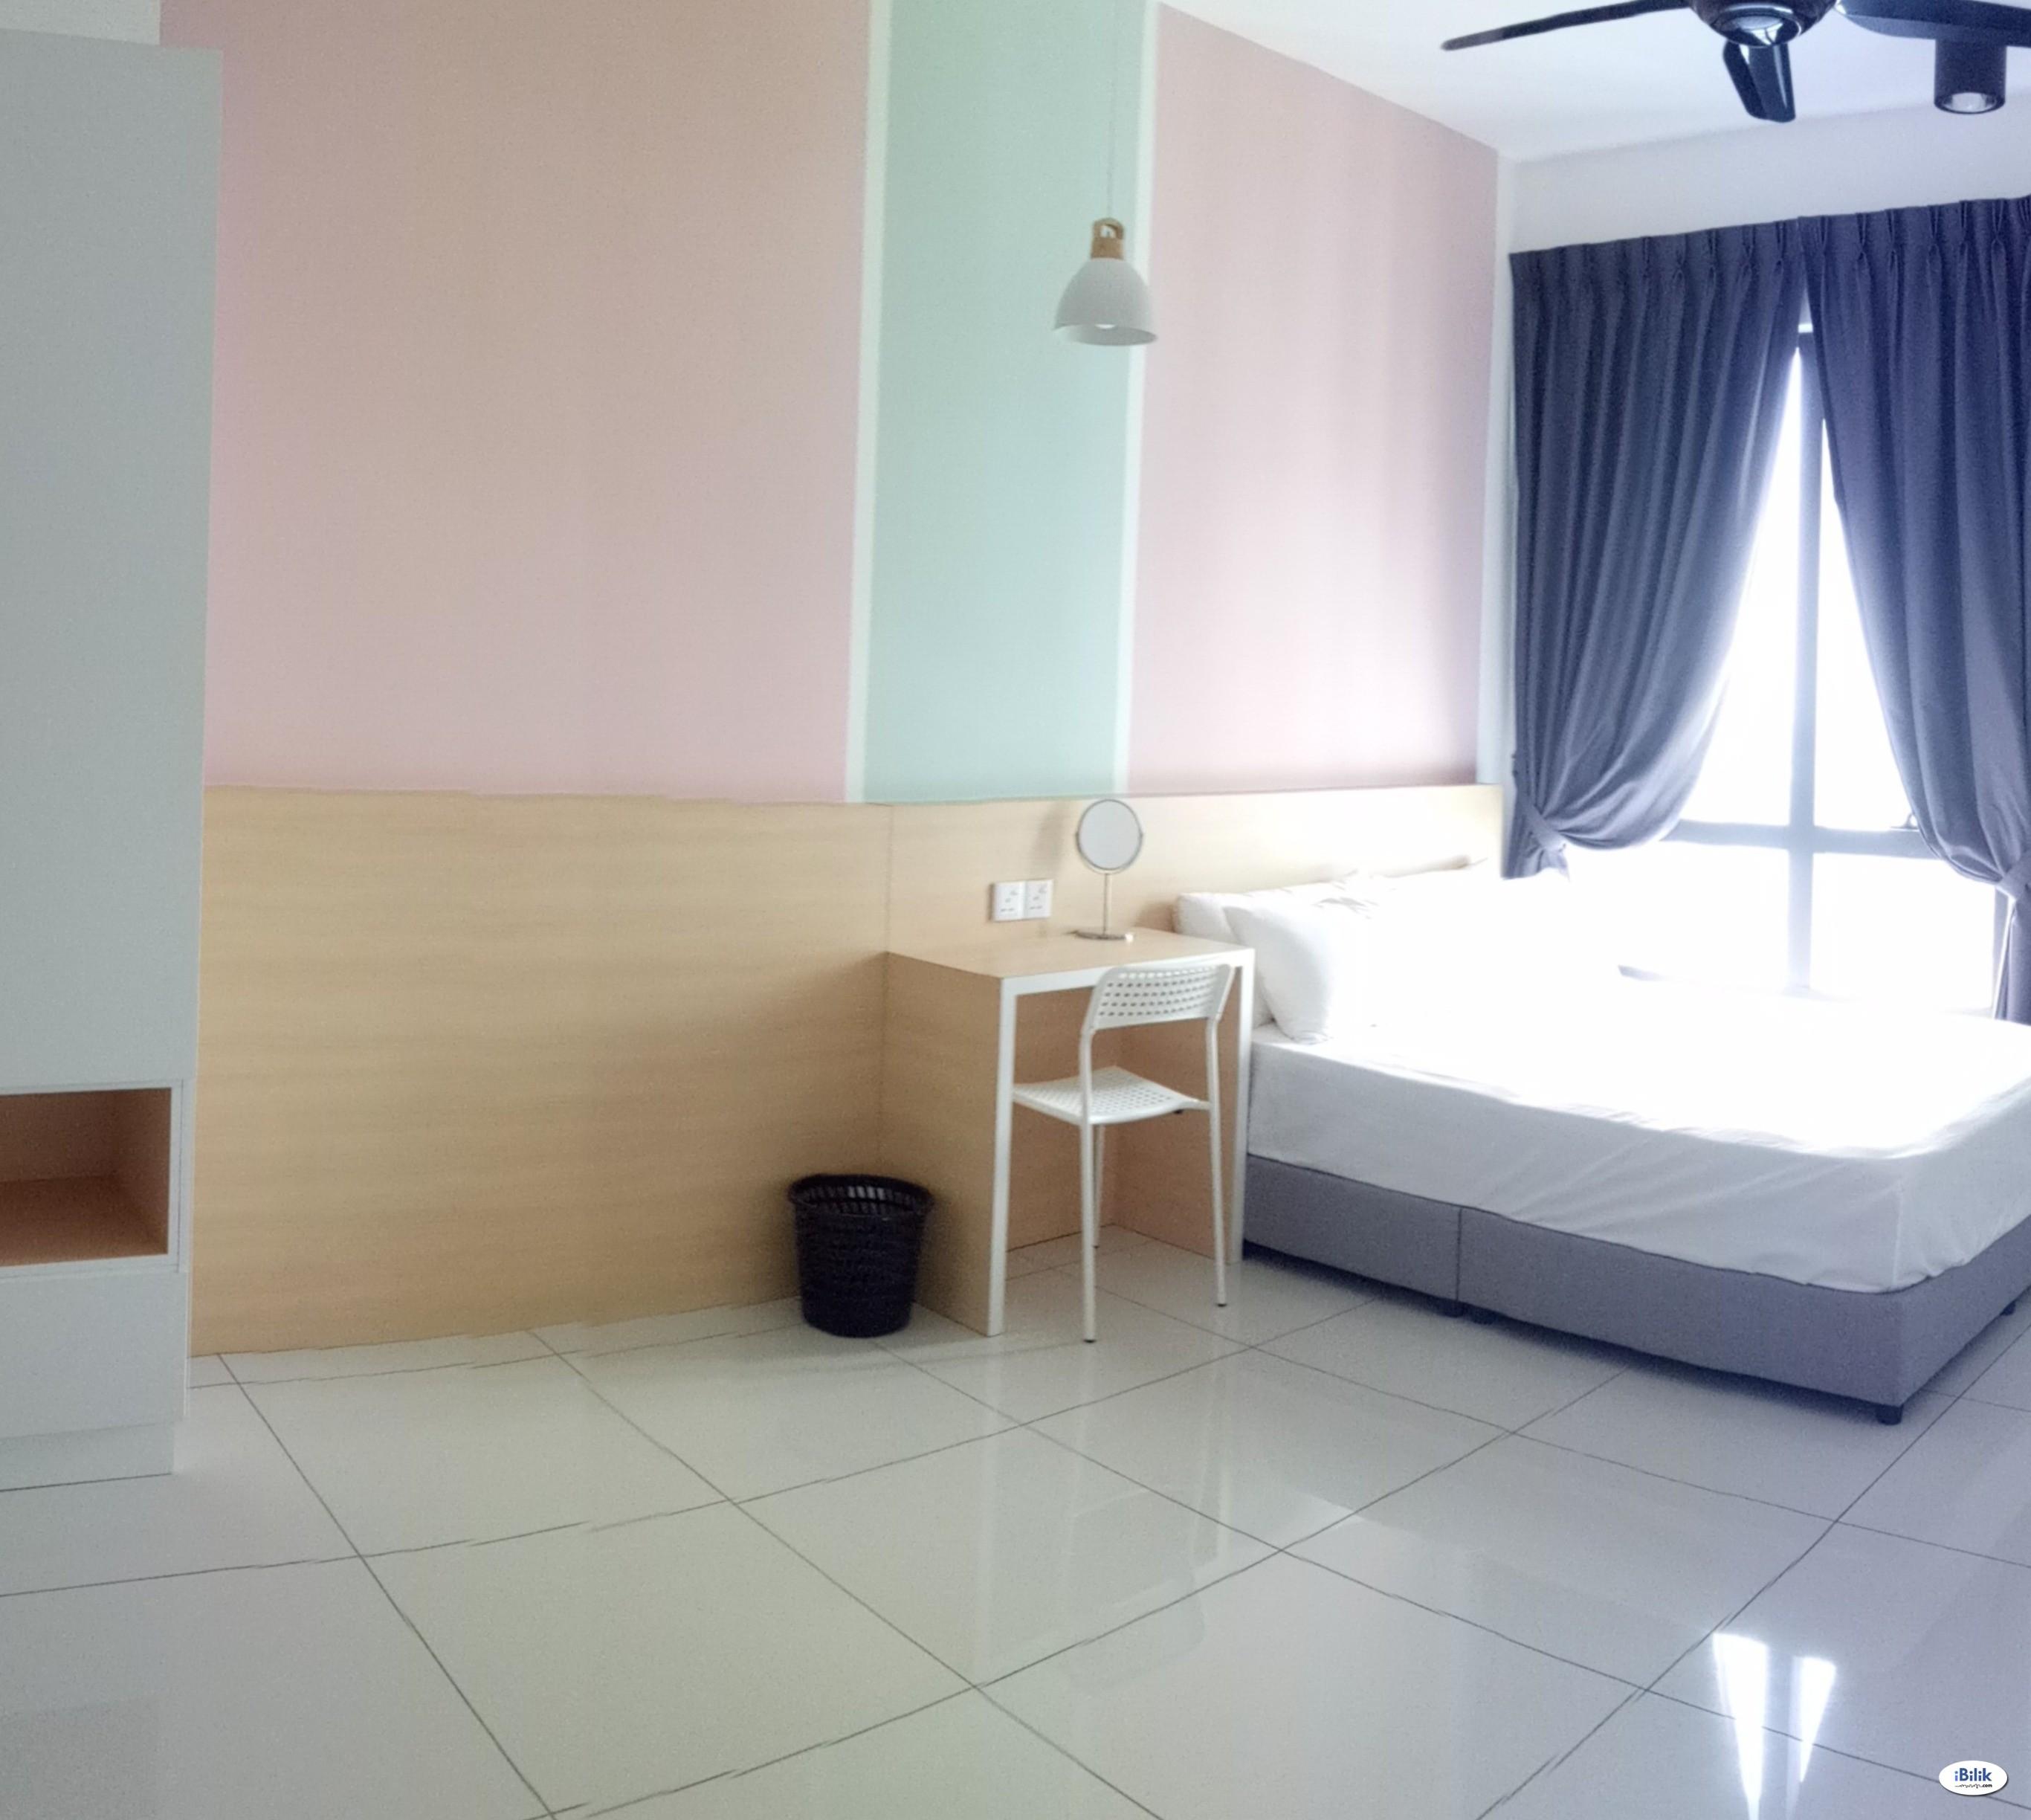 Cozy Room at Luminari, Butterworth